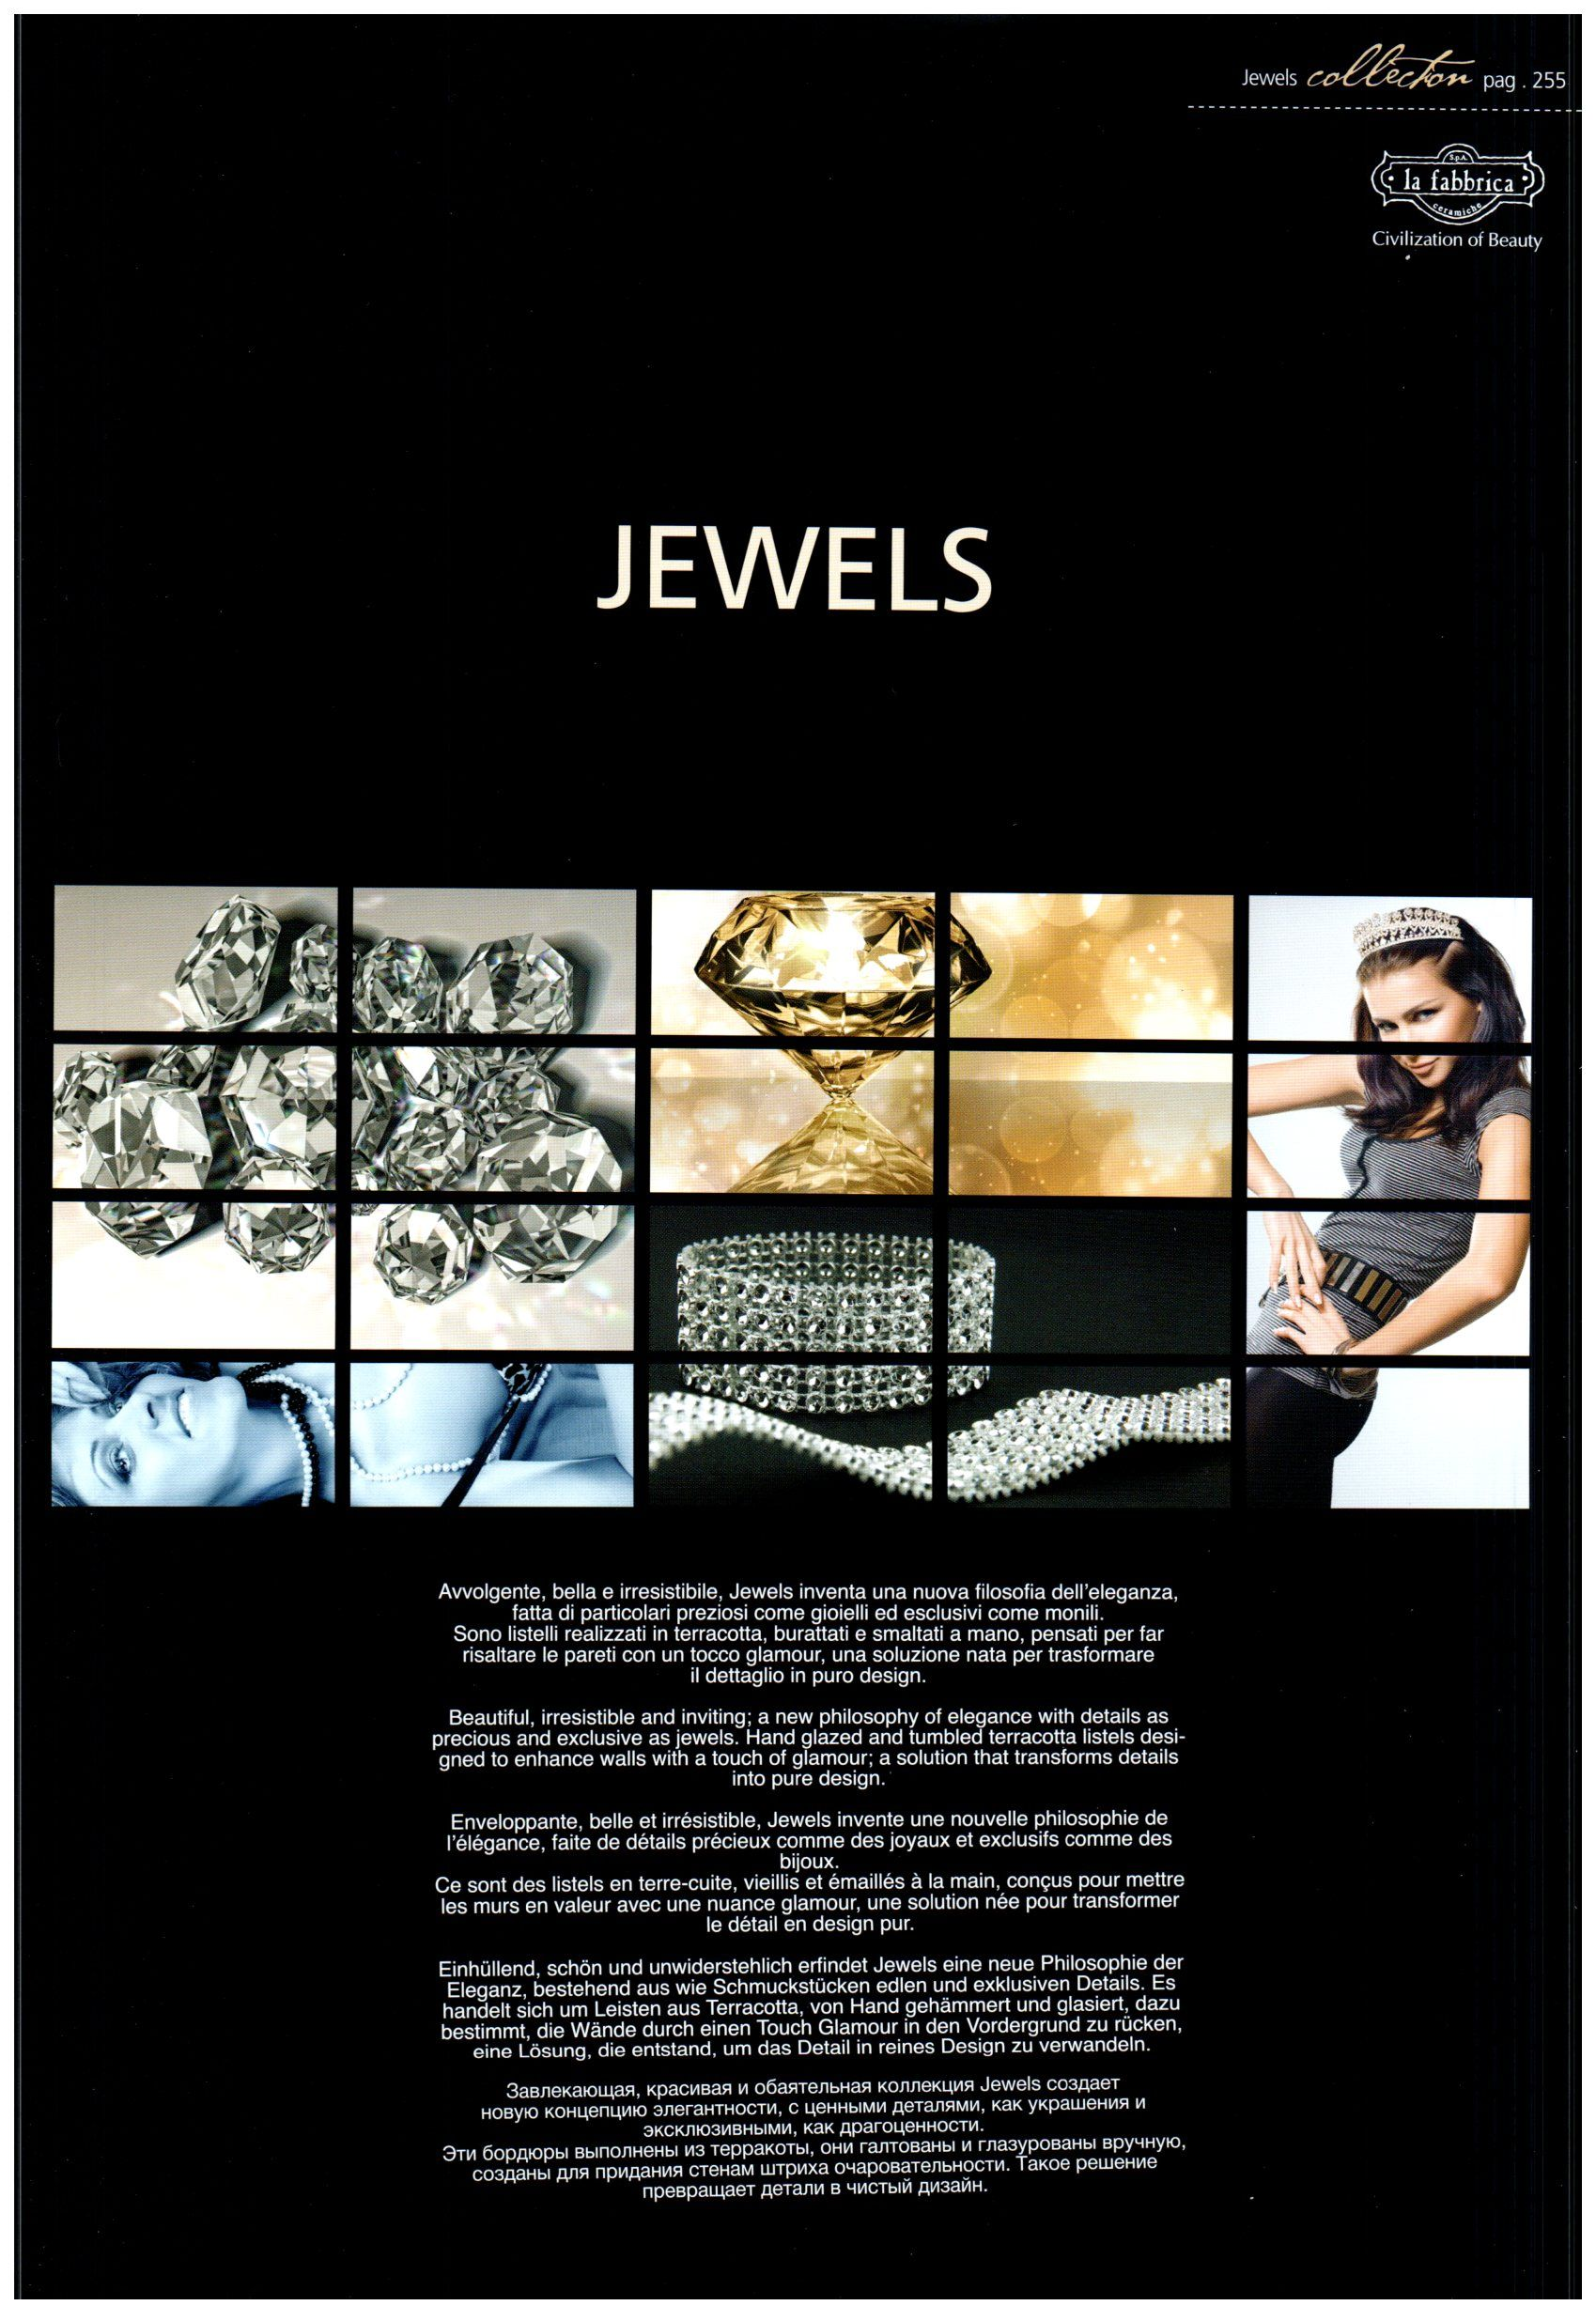 la fabbrica jewels collection